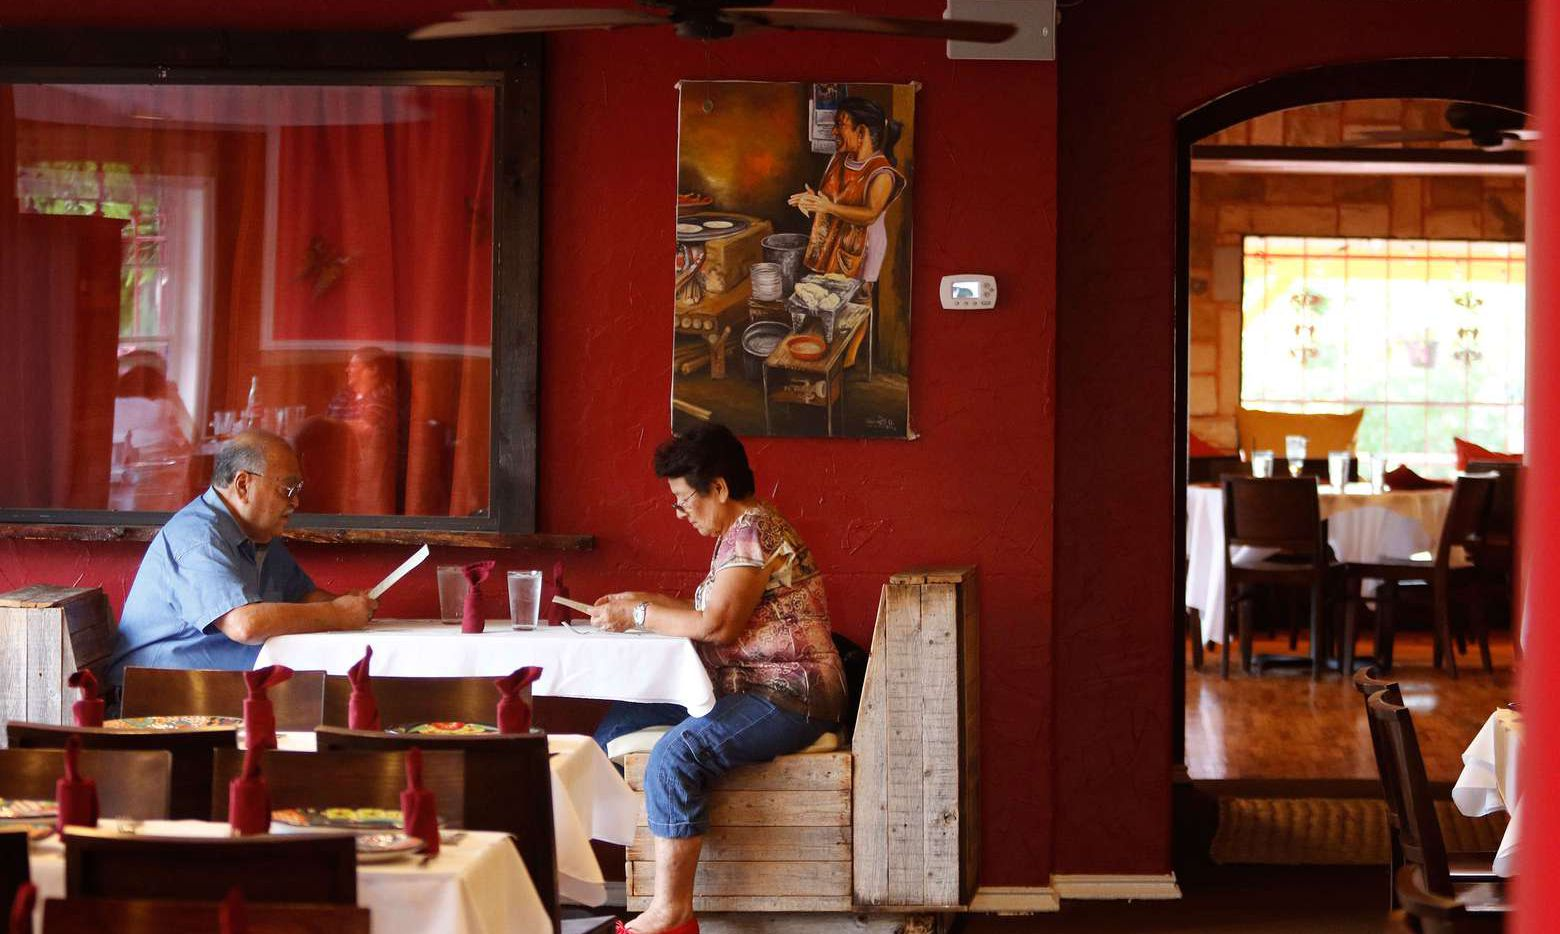 Comensales leen el menú de Campestre Chula Vista en Fort Worth. (Lawrence E. Jenkins/Contribución especial)